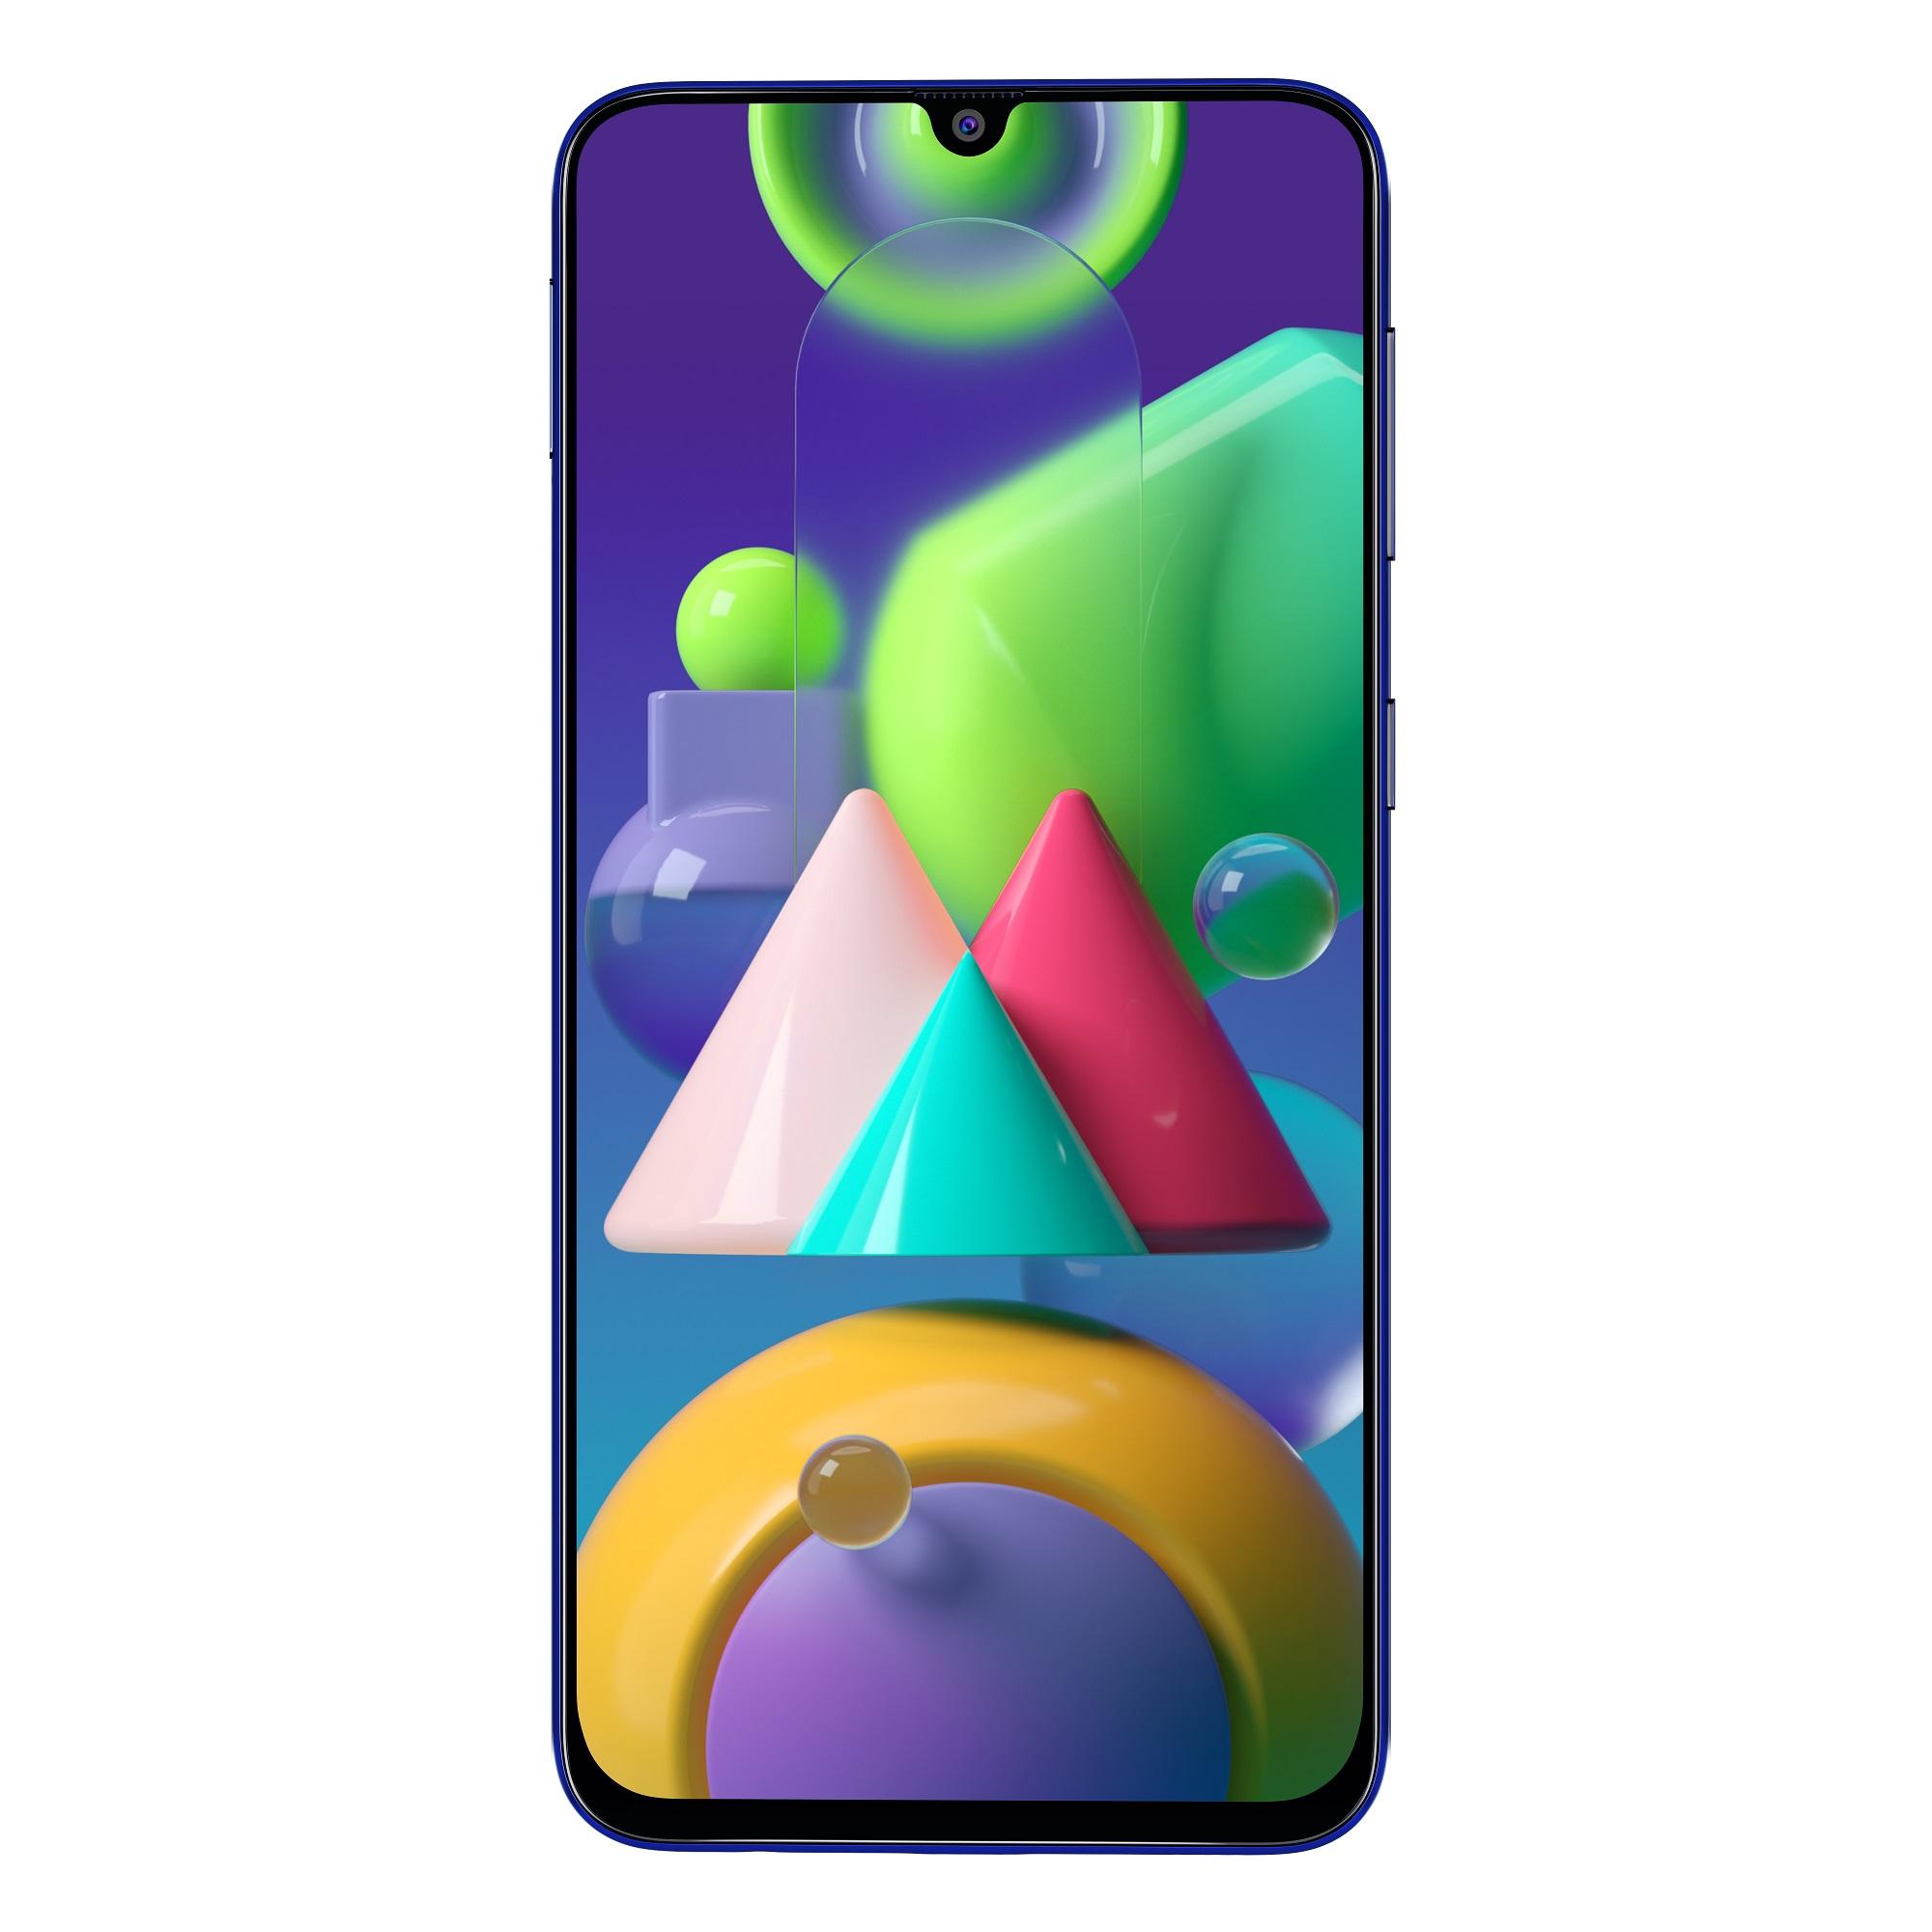 Samsung Launches Wattamonster Galaxy M21 With 6000mah Battery 48mp Camera And Samoled Display Samsung Newsroom India